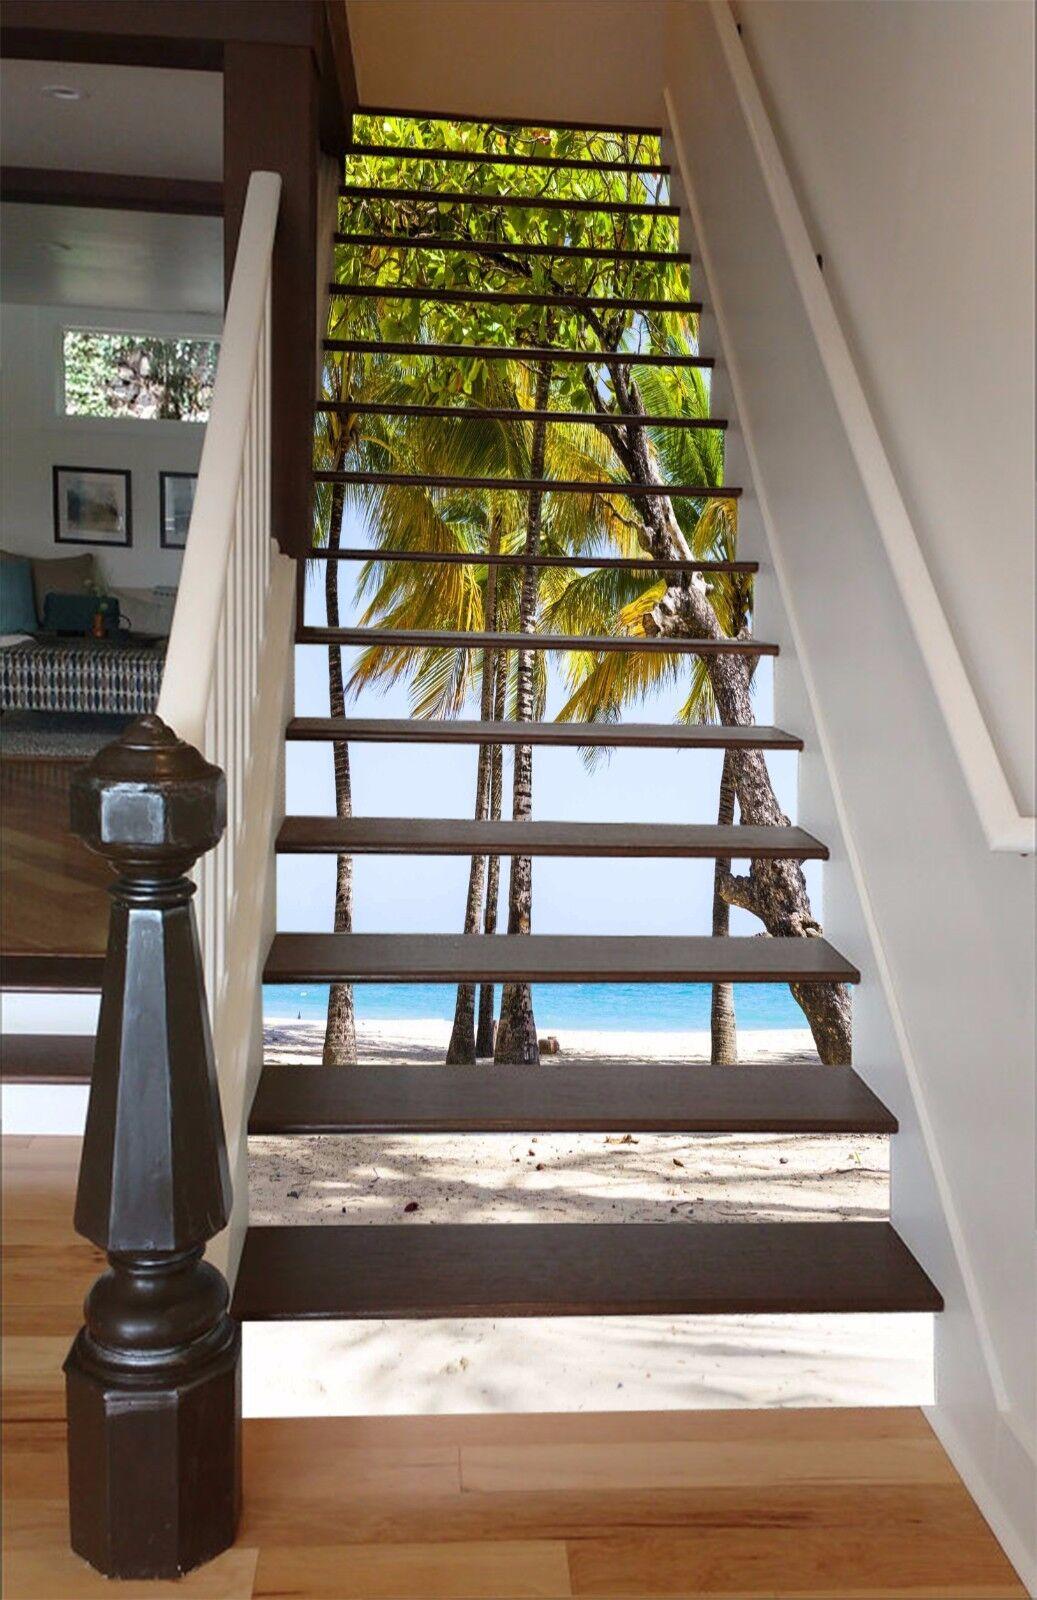 3D Tree Beach 5 Stair Risers Decoration Photo Mural Vinyl Decal Wallpaper UK